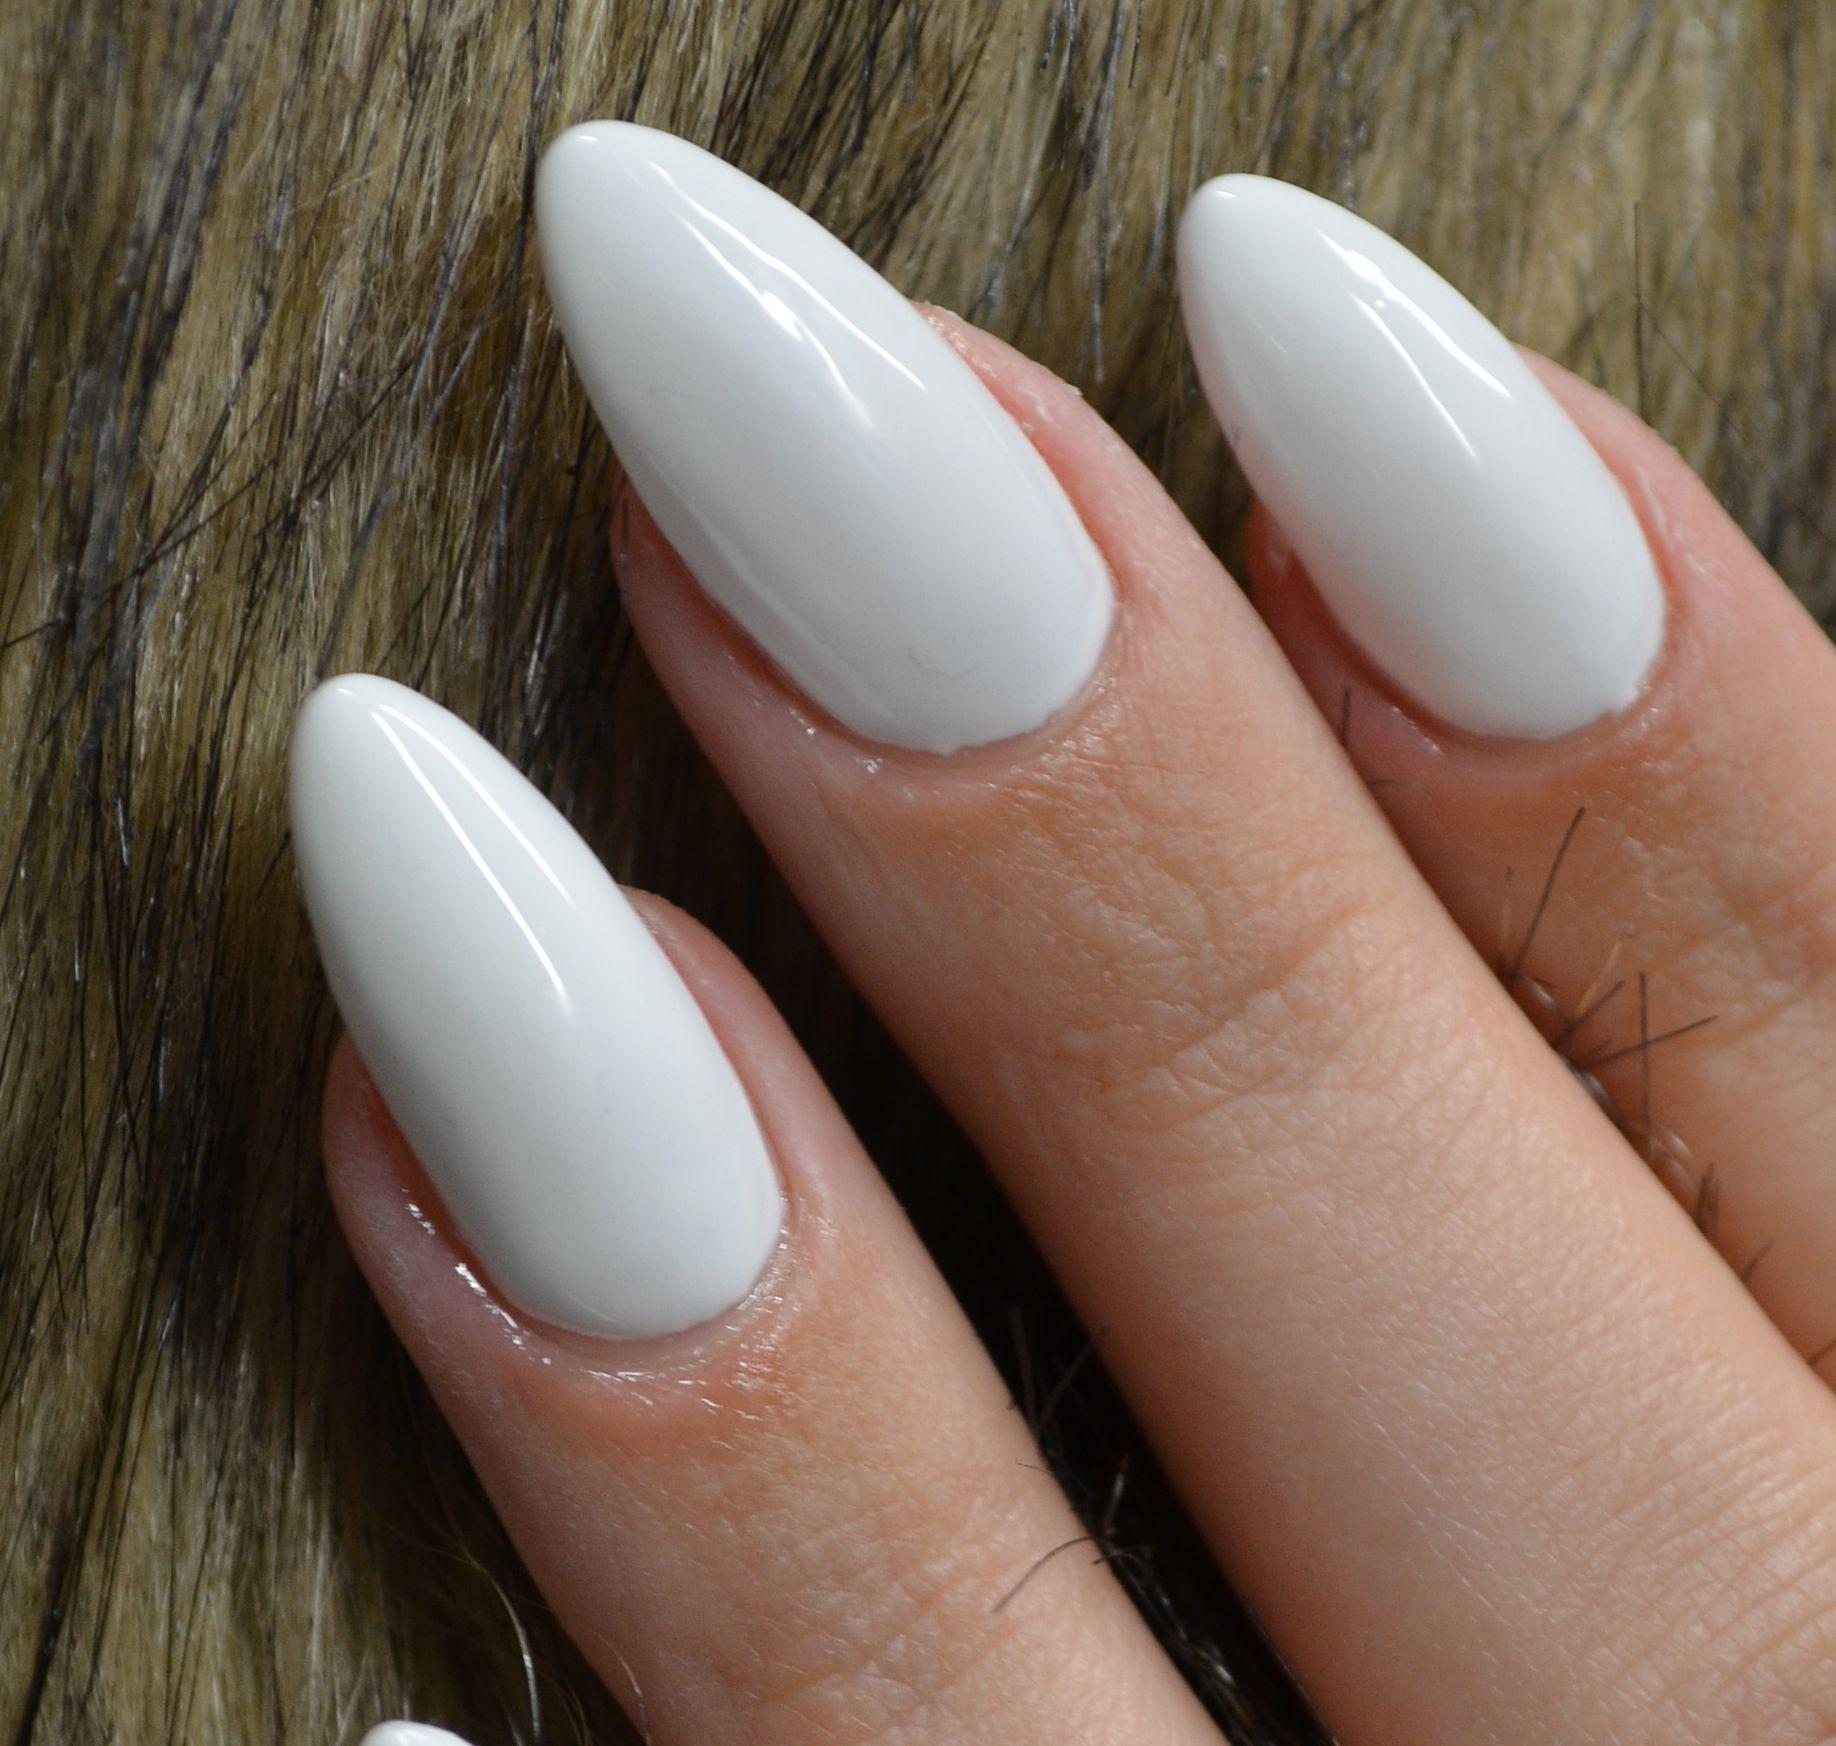 Full color nail art - White Fullcolor Almond Shaped Nails No Nailart Just Color